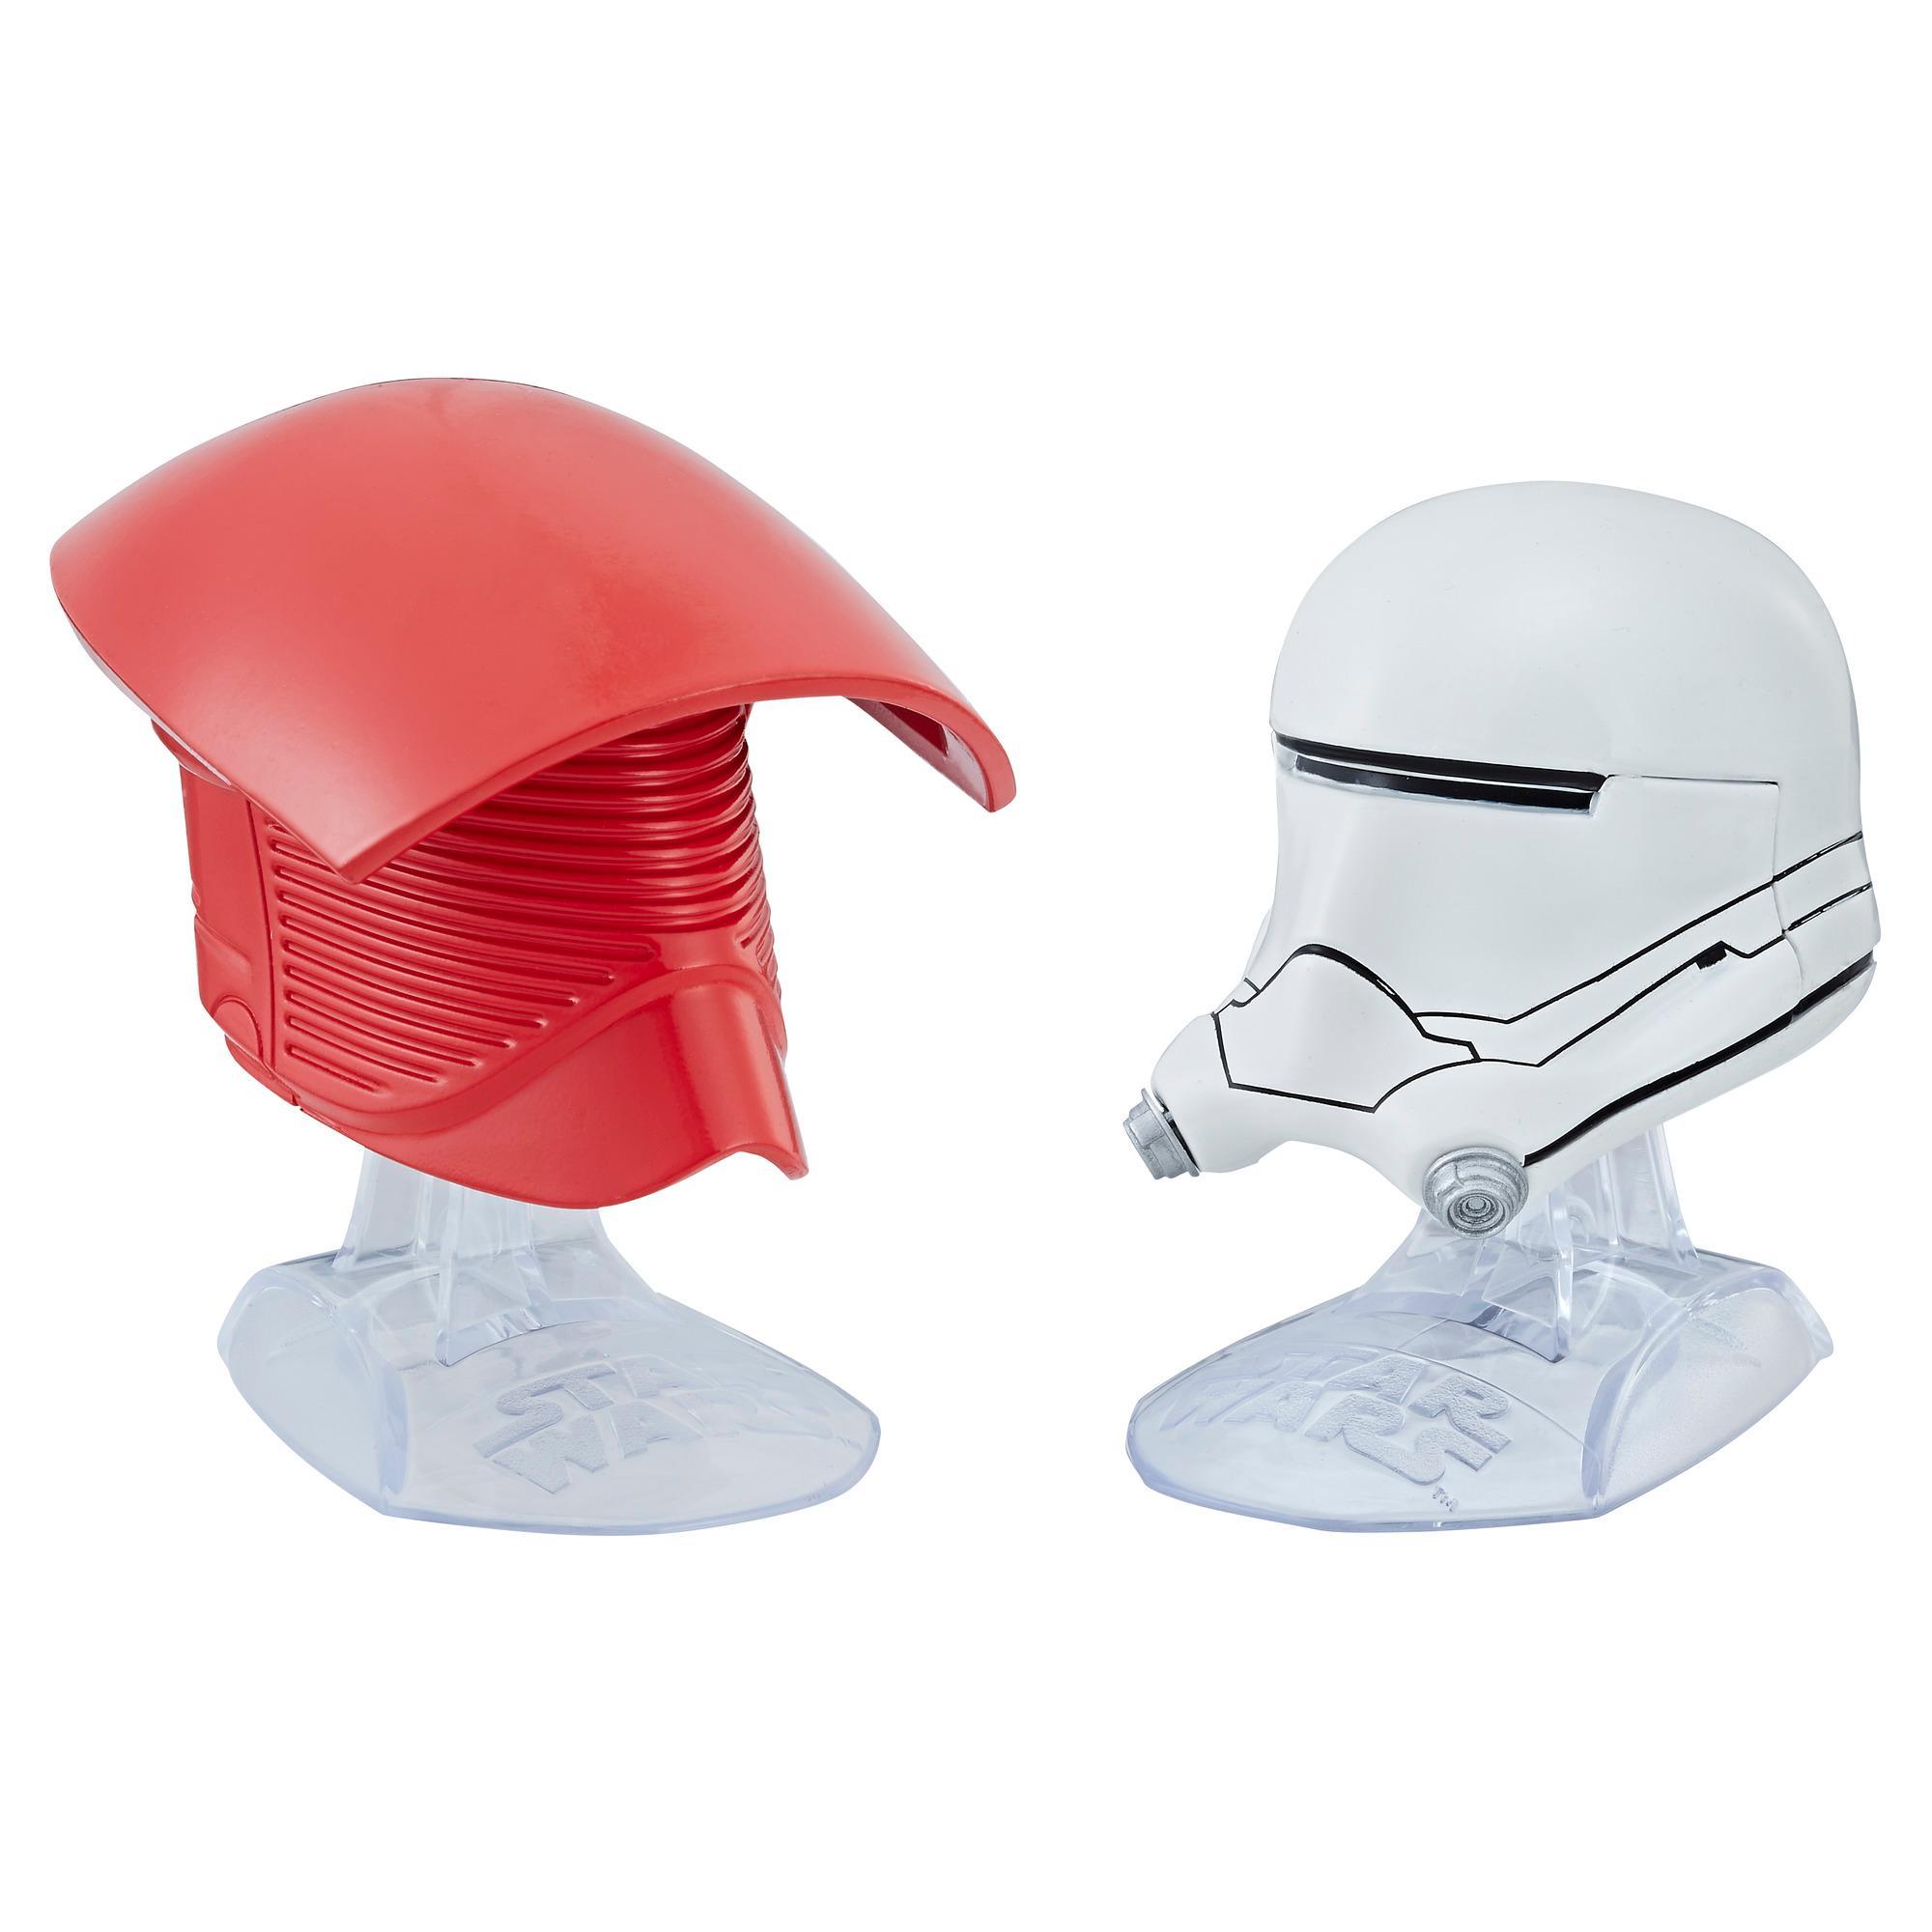 Star Wars Titanium Series Elite Praetorian Guard & First Order Flametrooper Helmets